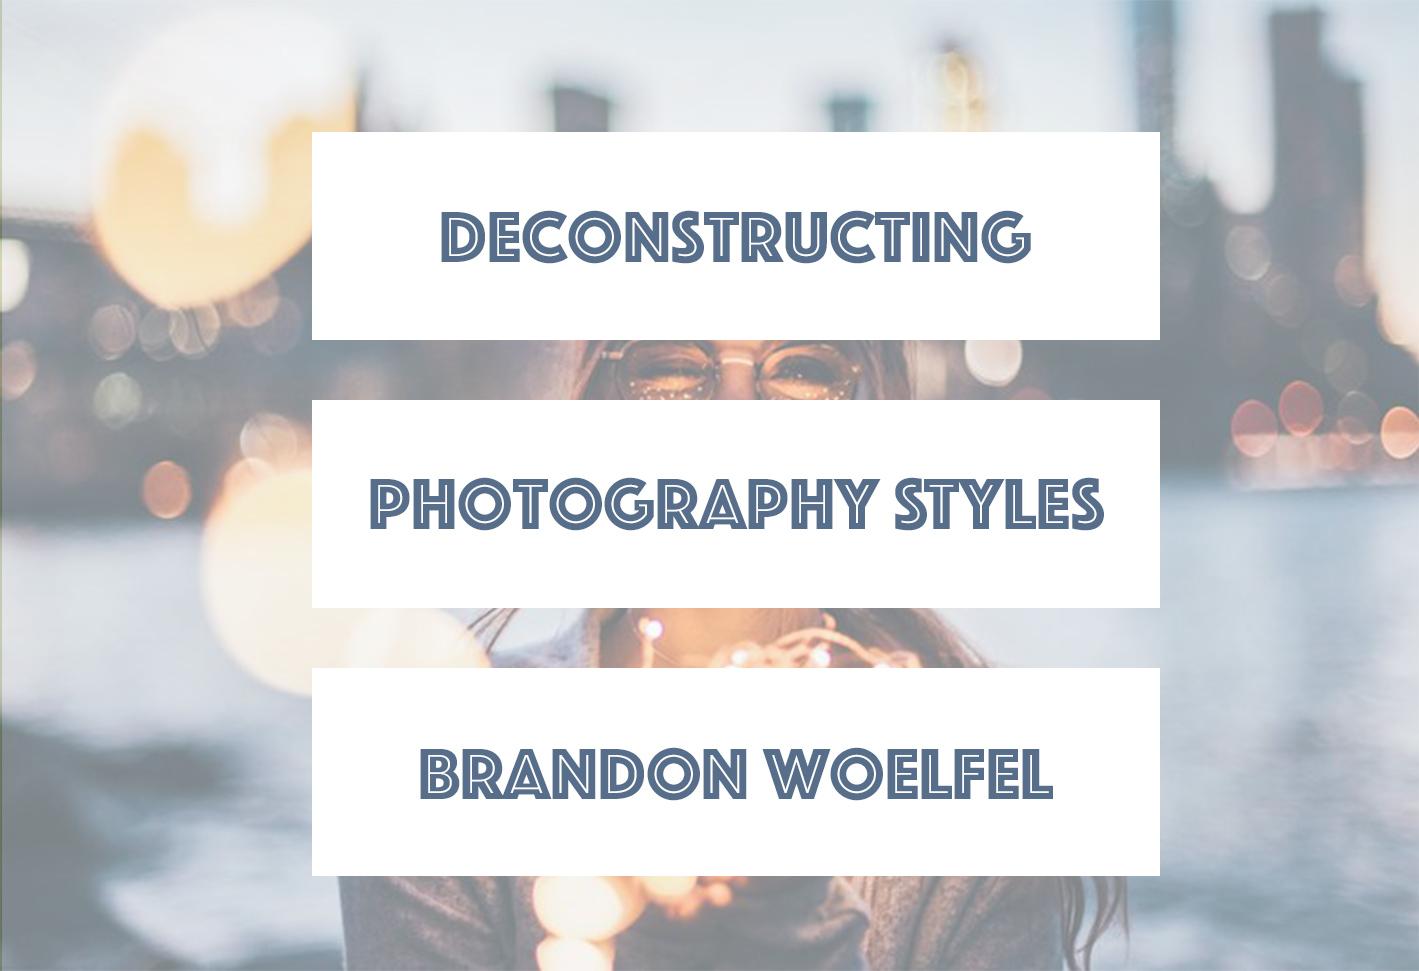 Brandon Woelfel